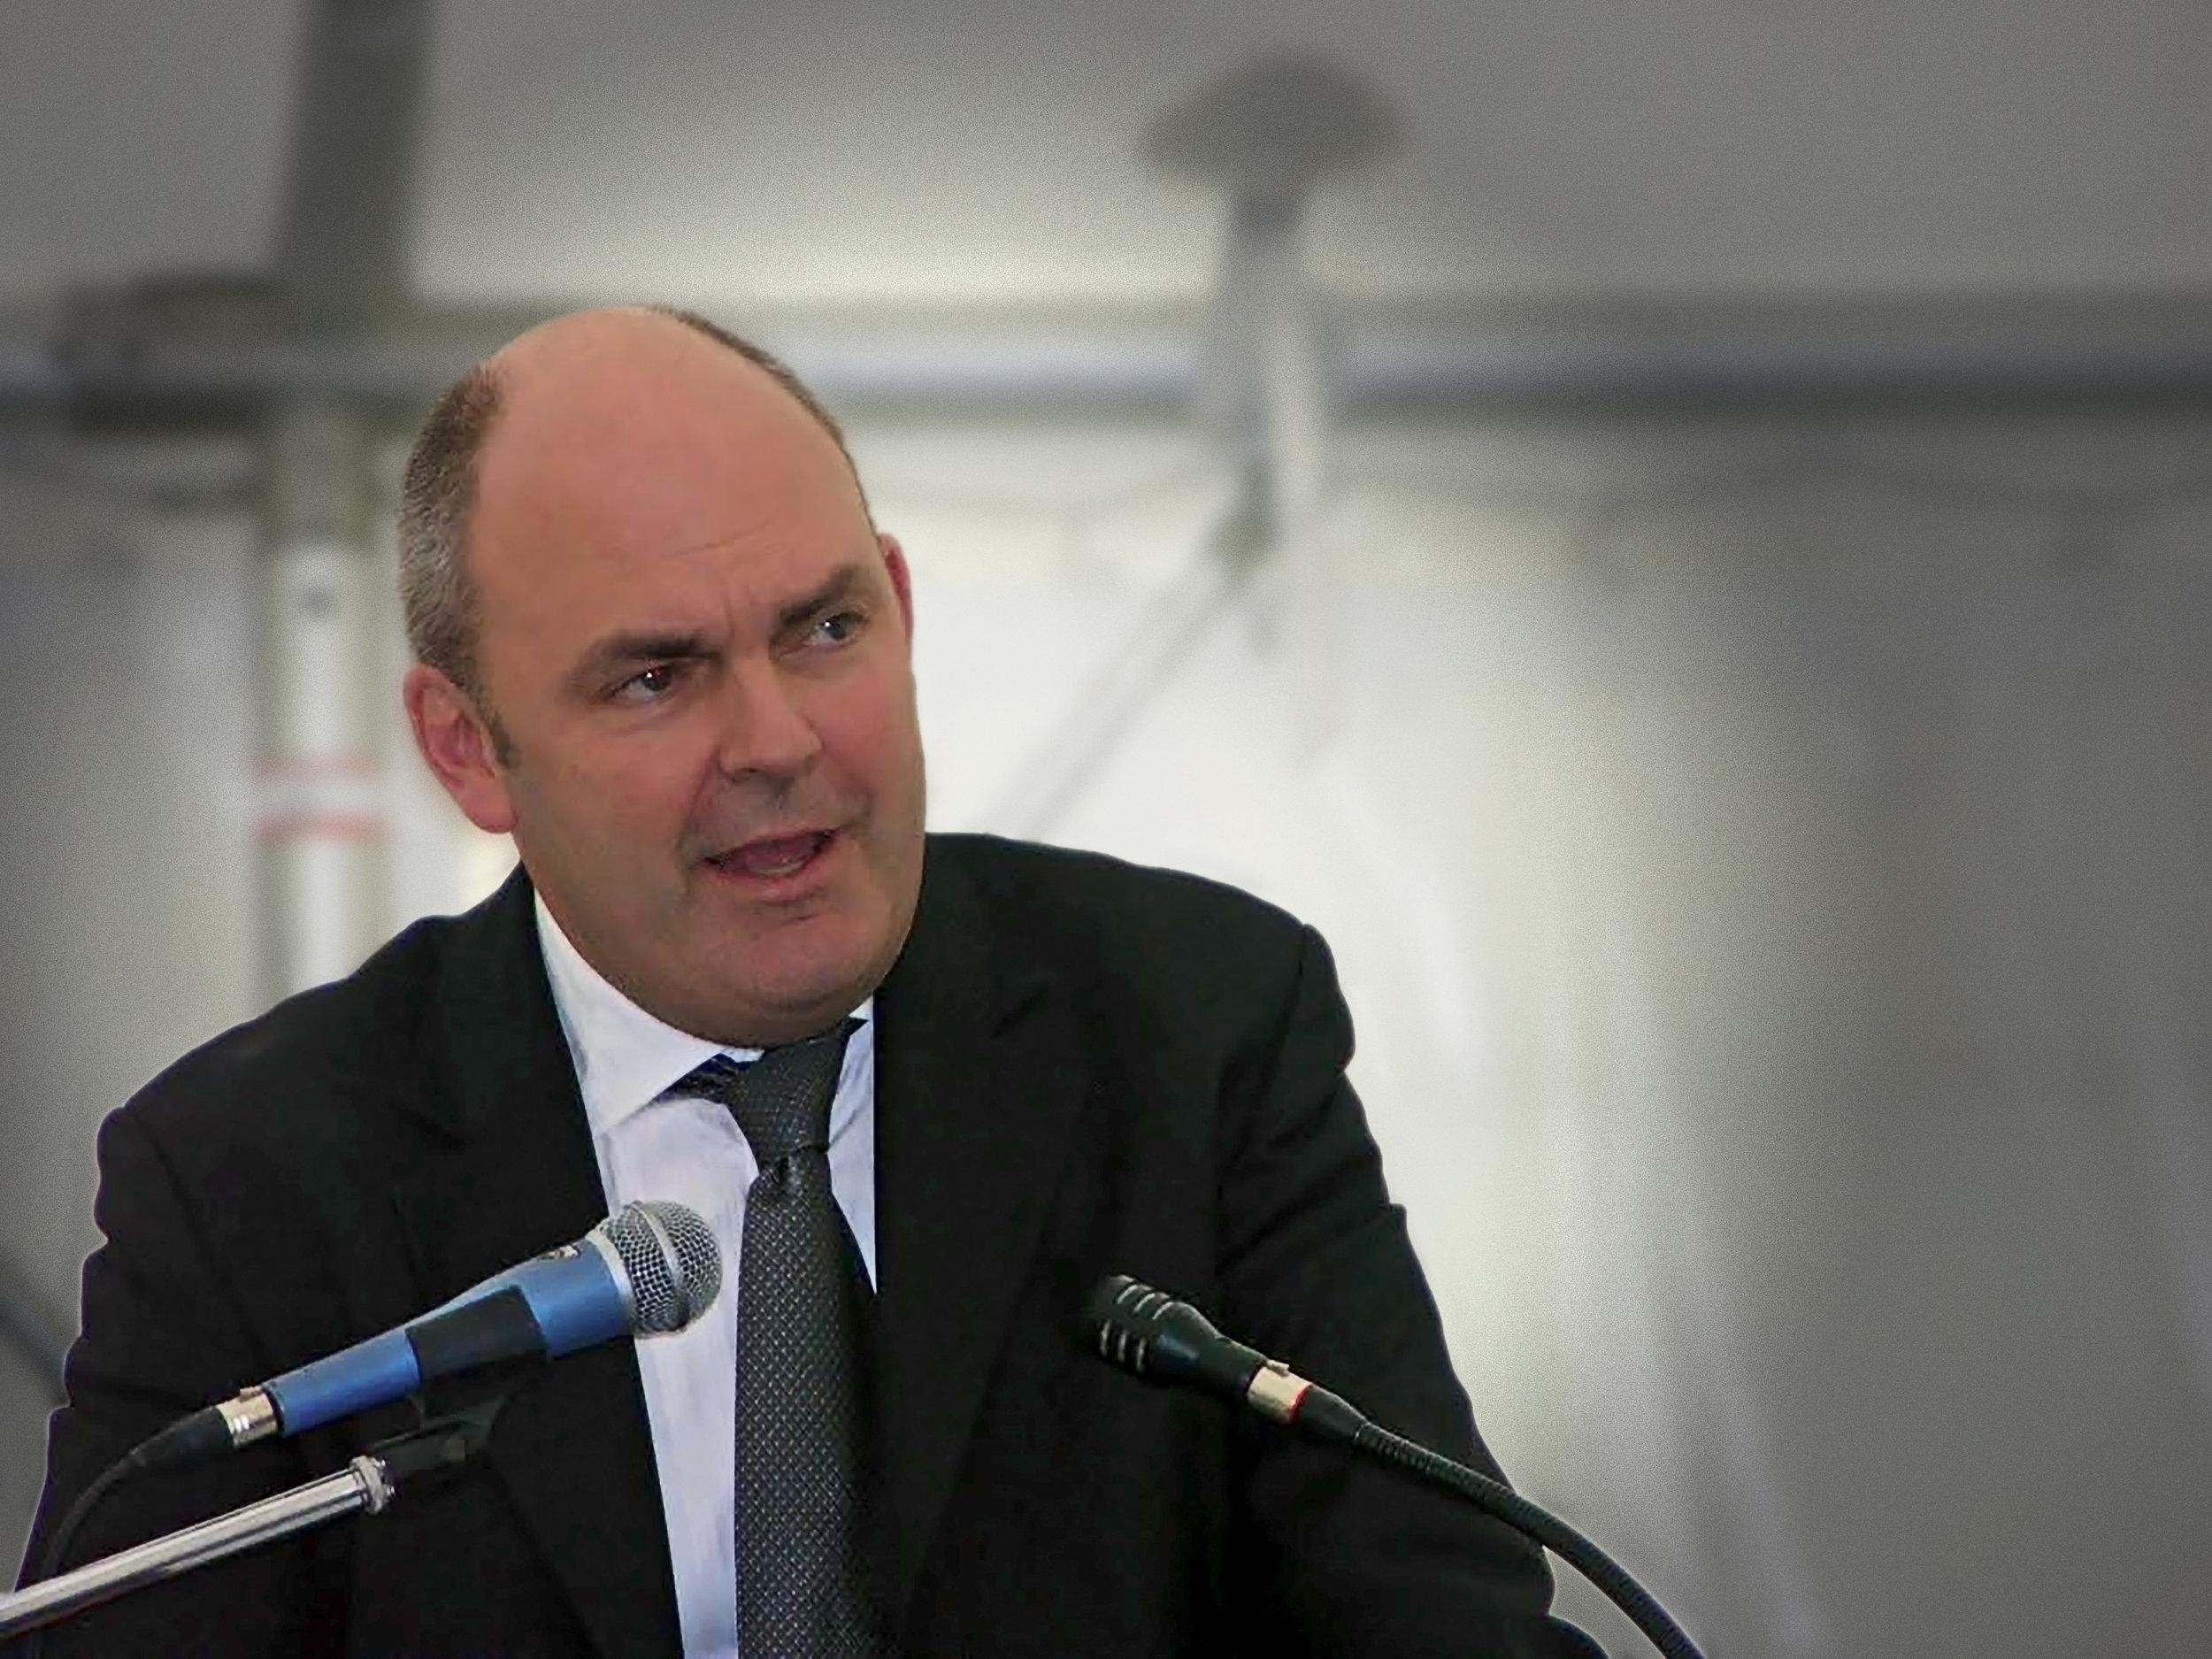 TRANSPORT MINISTER: Requests more information